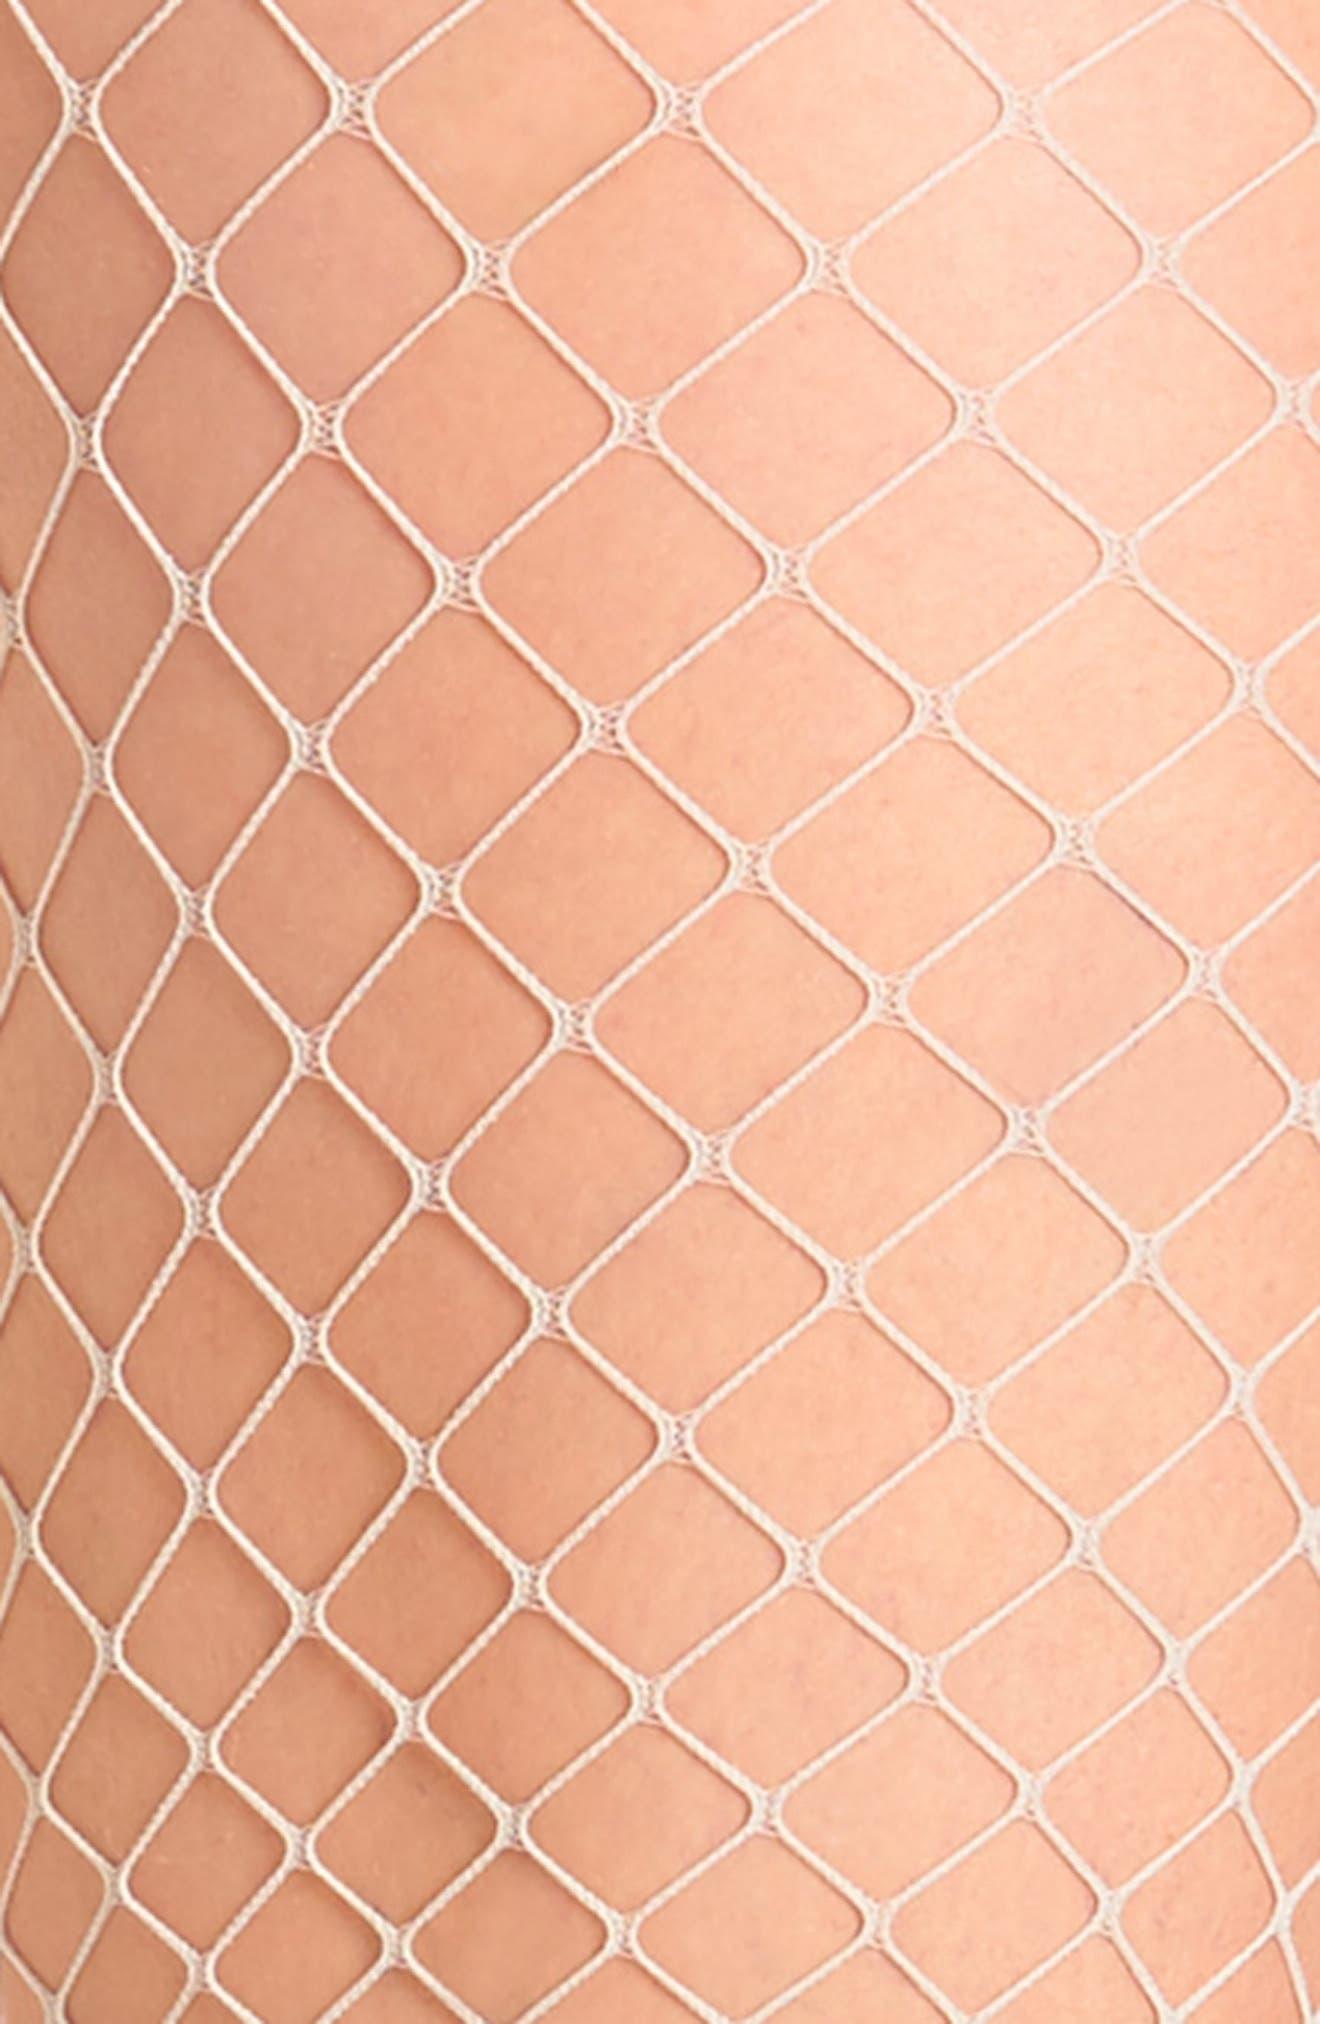 Libby Fishnet Tights,                             Alternate thumbnail 2, color,                             250